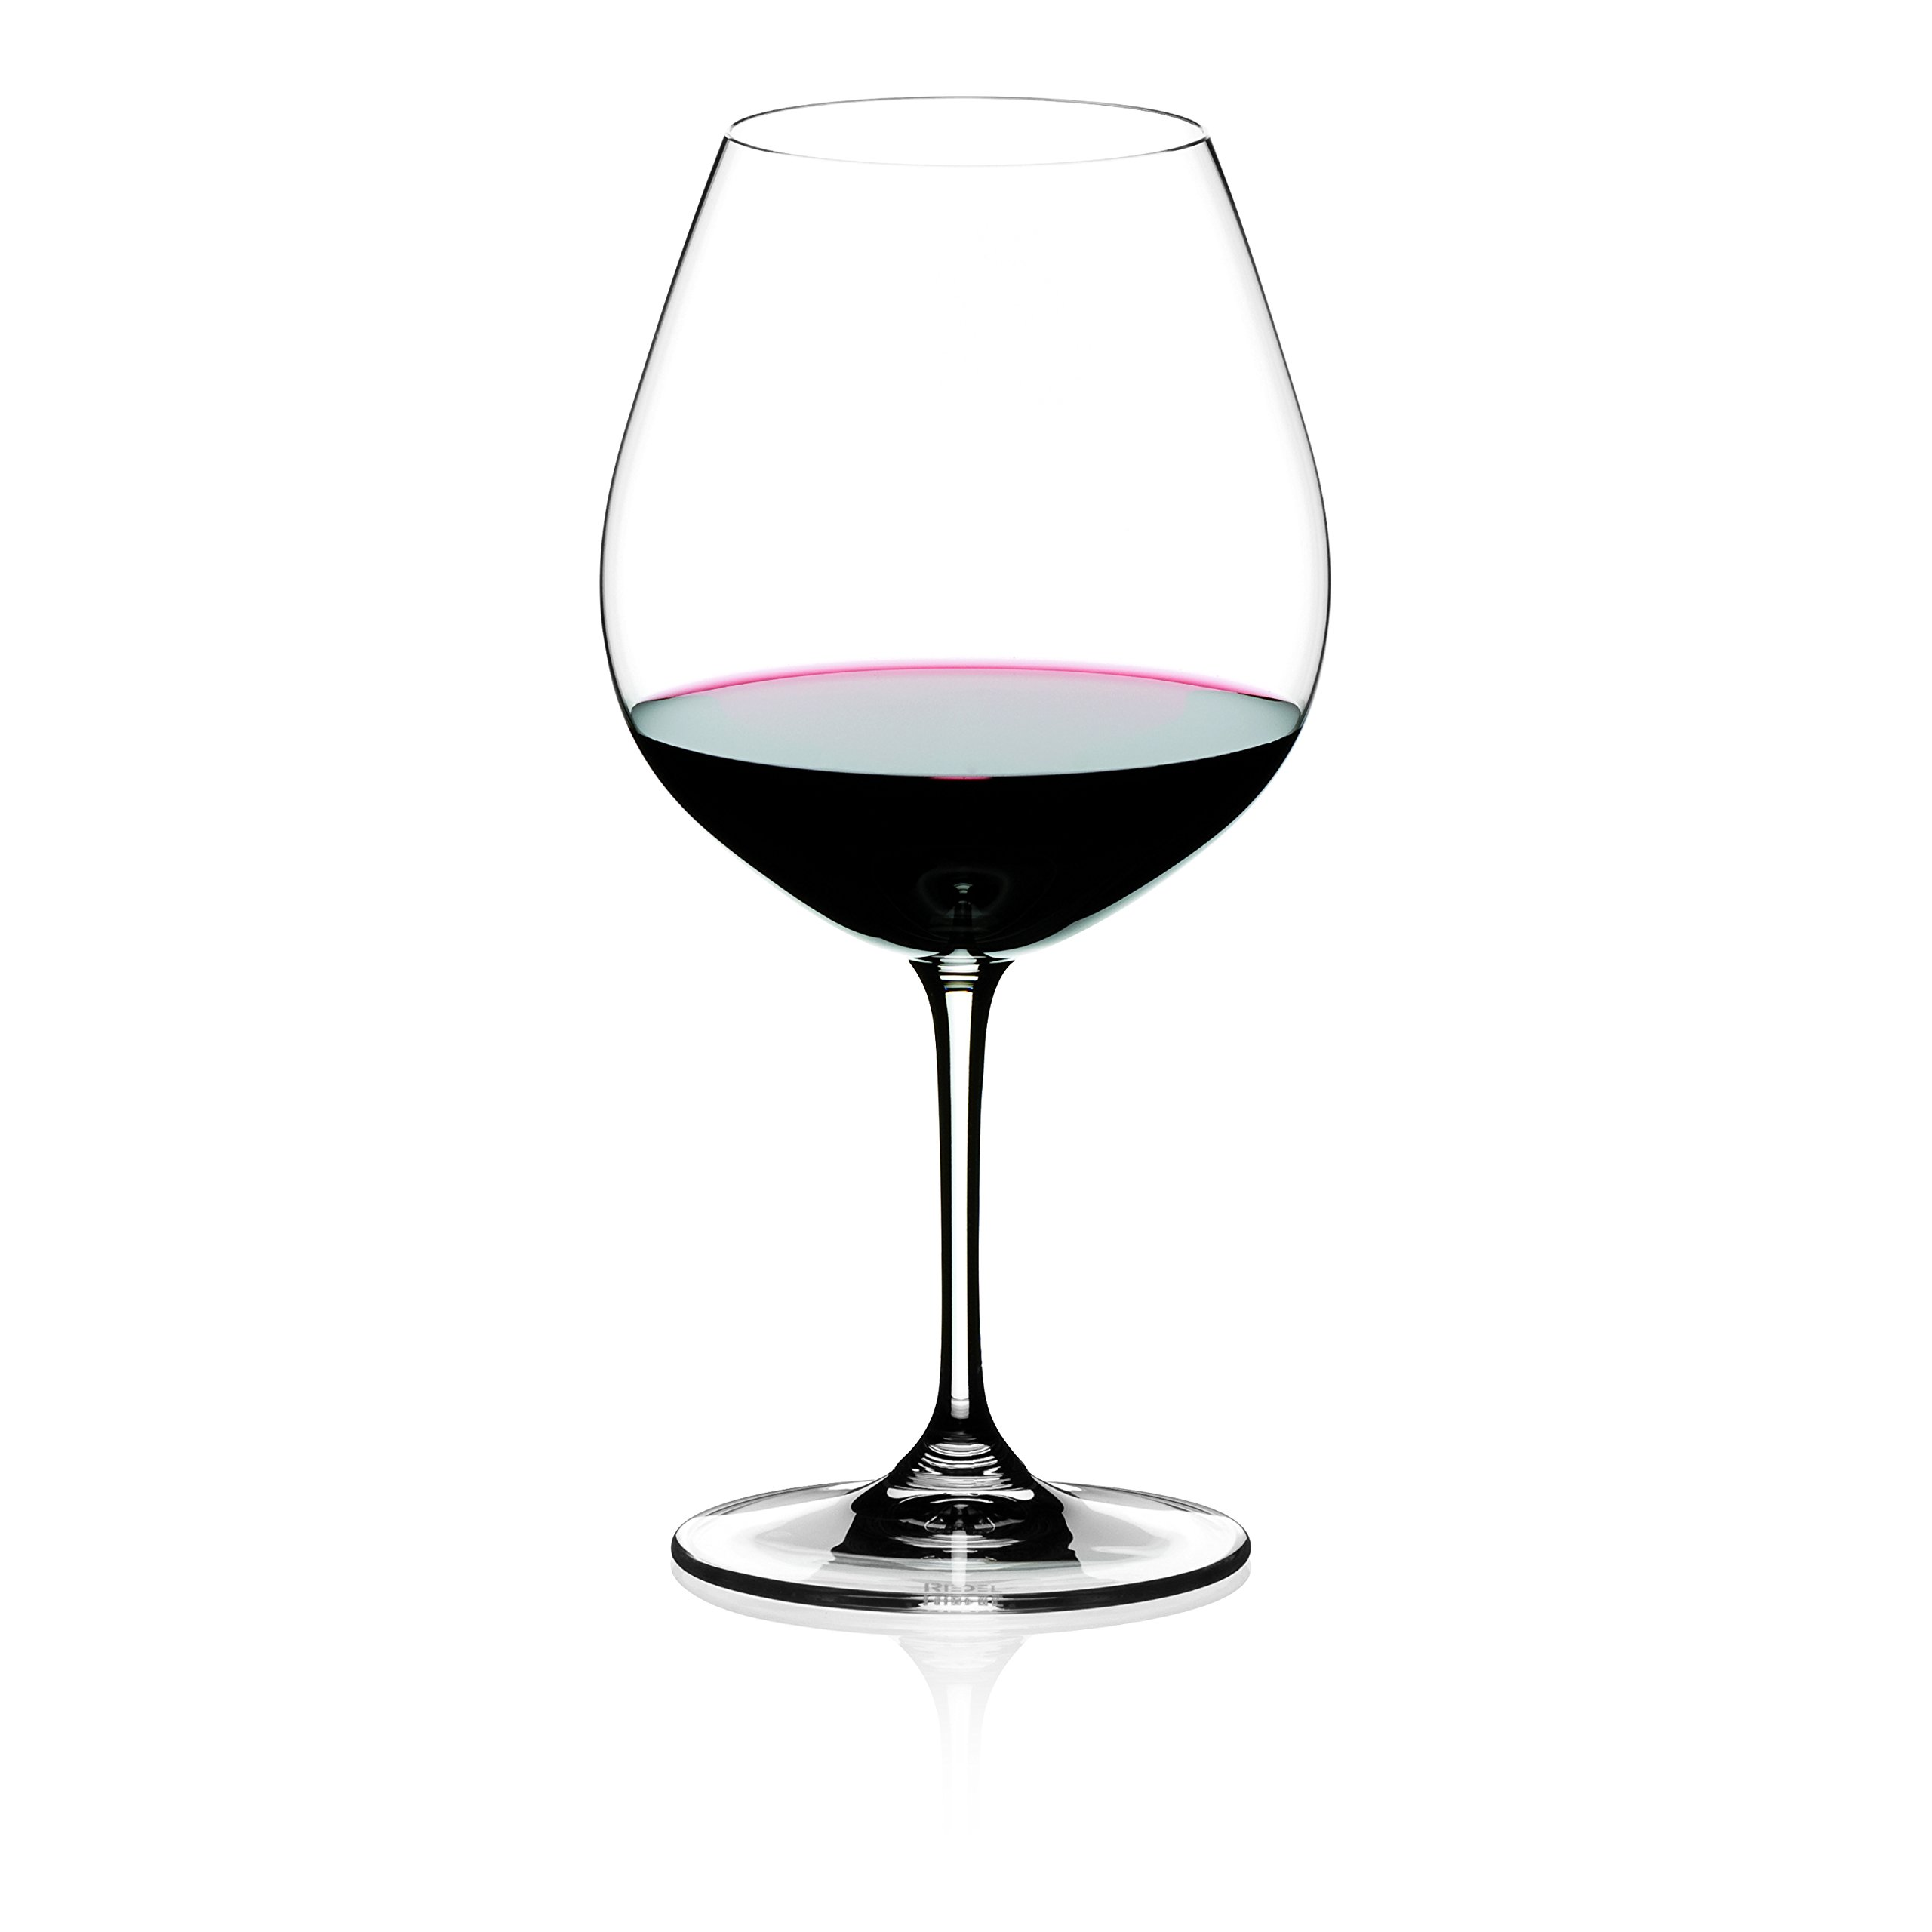 Riedel Vinum Leaded Crystal Pinot Noir/Burgundy Wine Glass, Set of 4